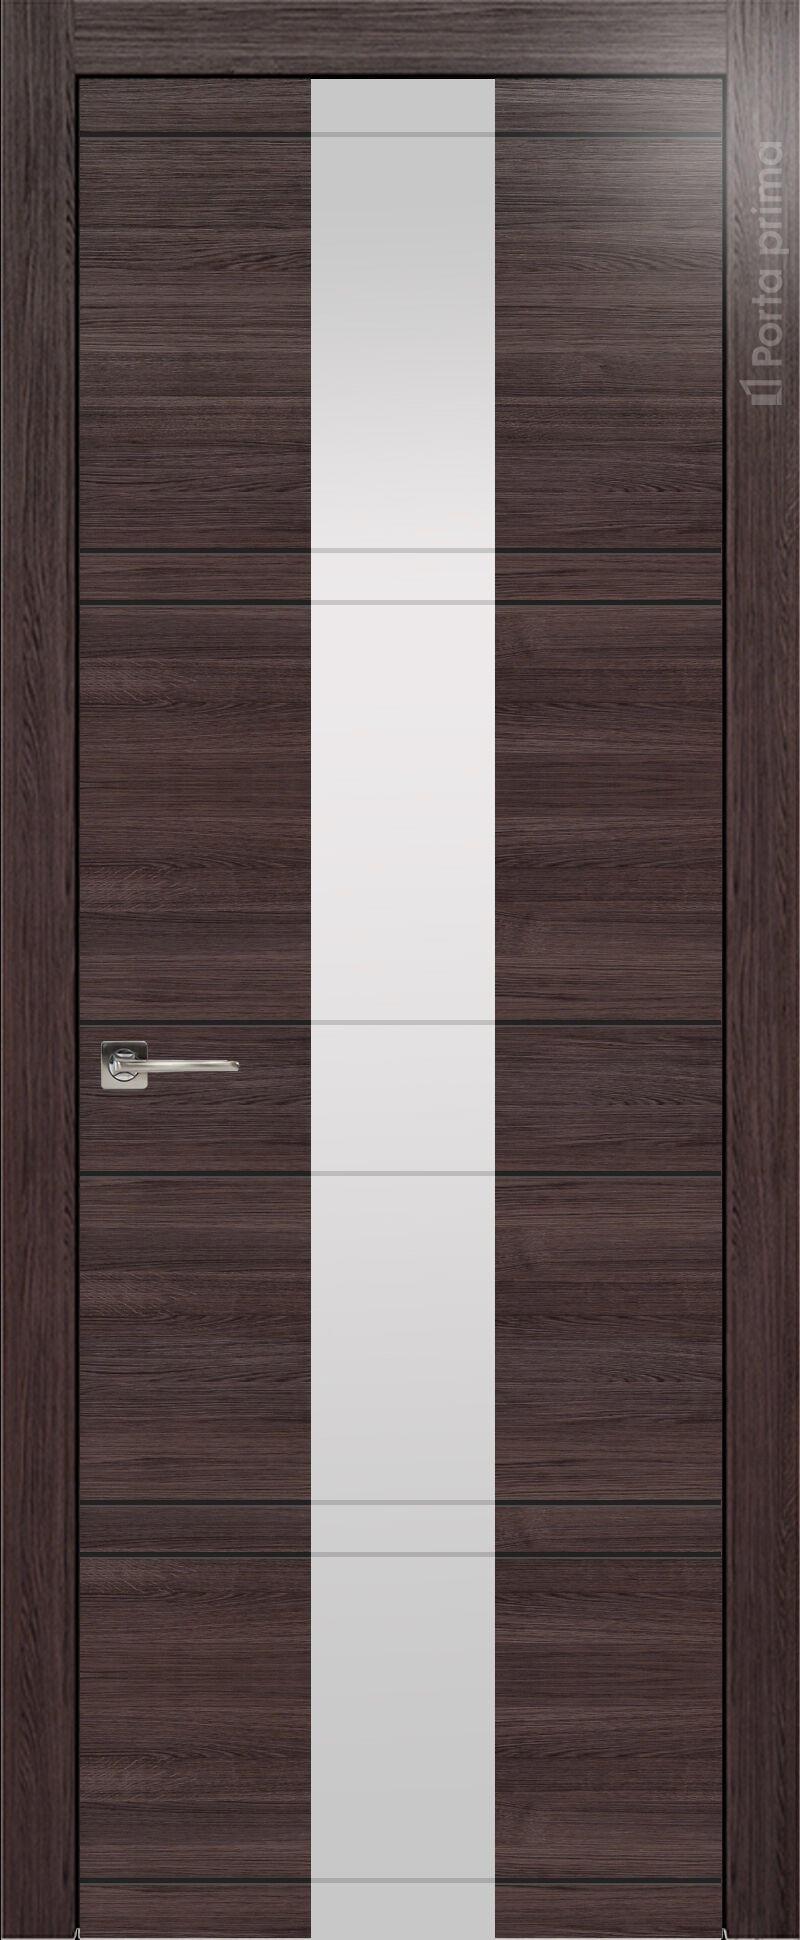 Tivoli Ж-2 цвет - Венге Нуар Со стеклом (ДО)